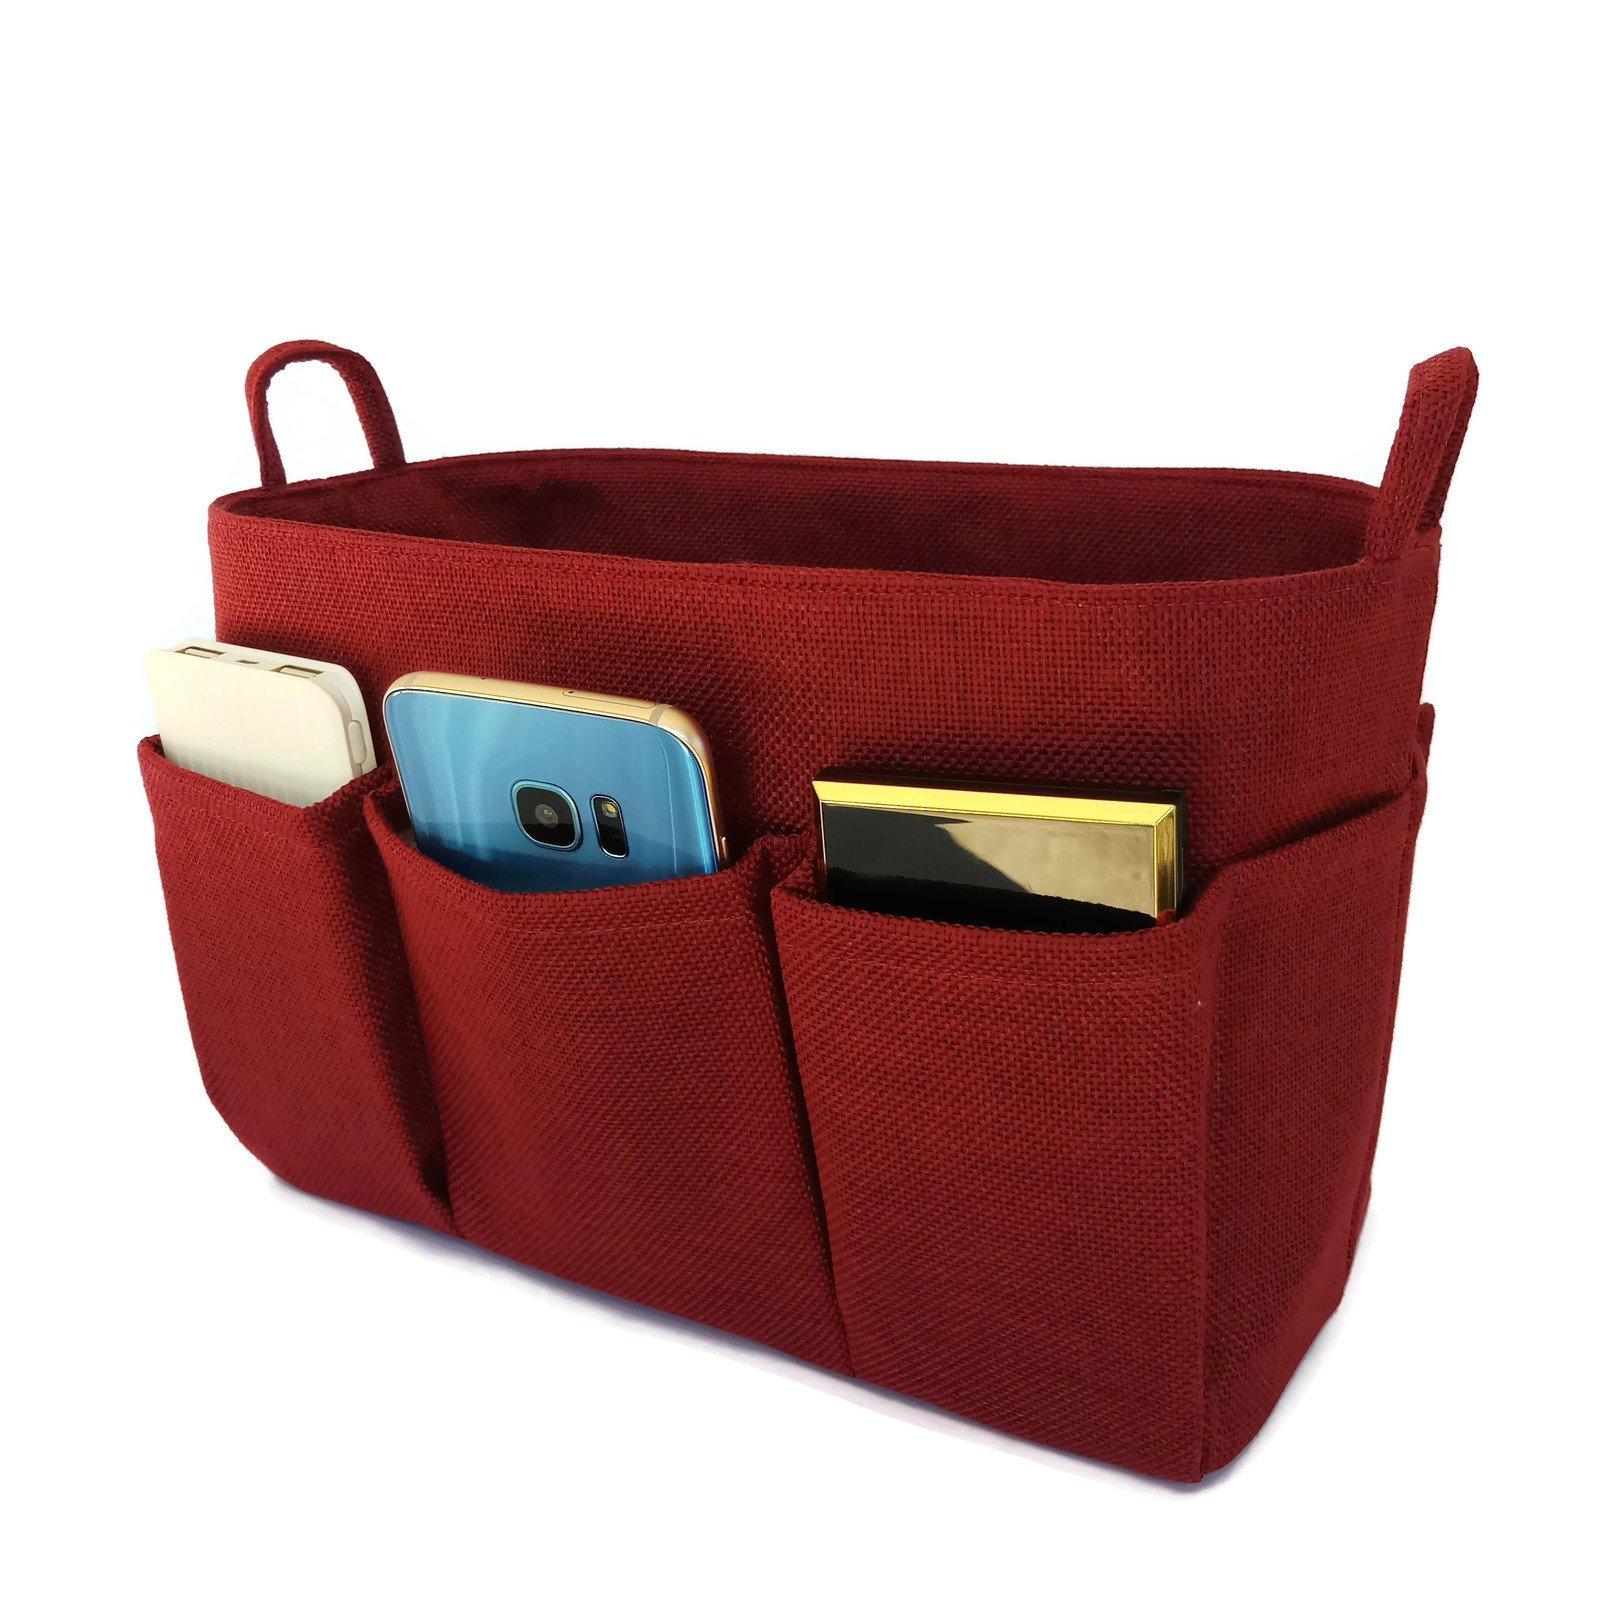 K&M Quality Product Medium Purse Organizer Insert, Tote Organizer, Handbag Organizer : Medium Size by K&M (Wine Red)